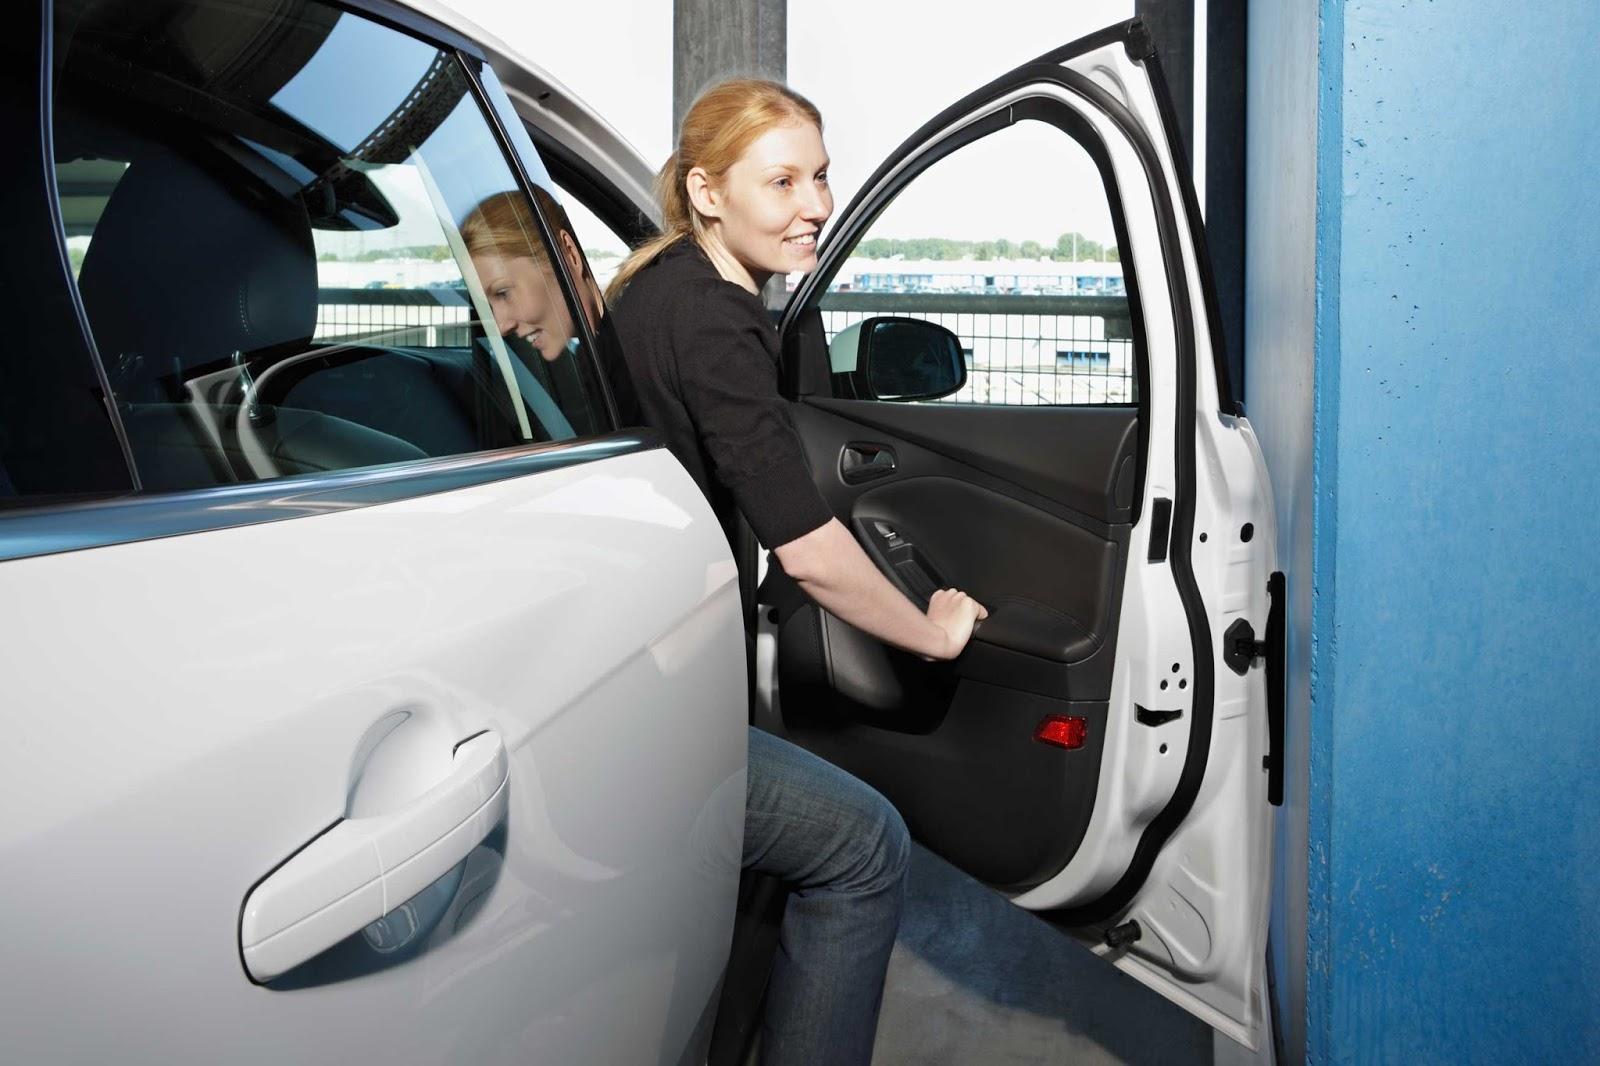 Ford Door Edge Protector 01 Το νέο Ford Focus 1.5L diesel καταναλώνει μόλις 3,4lt/100Km και έχει μηδενικά τέλη κυκλοφορίας